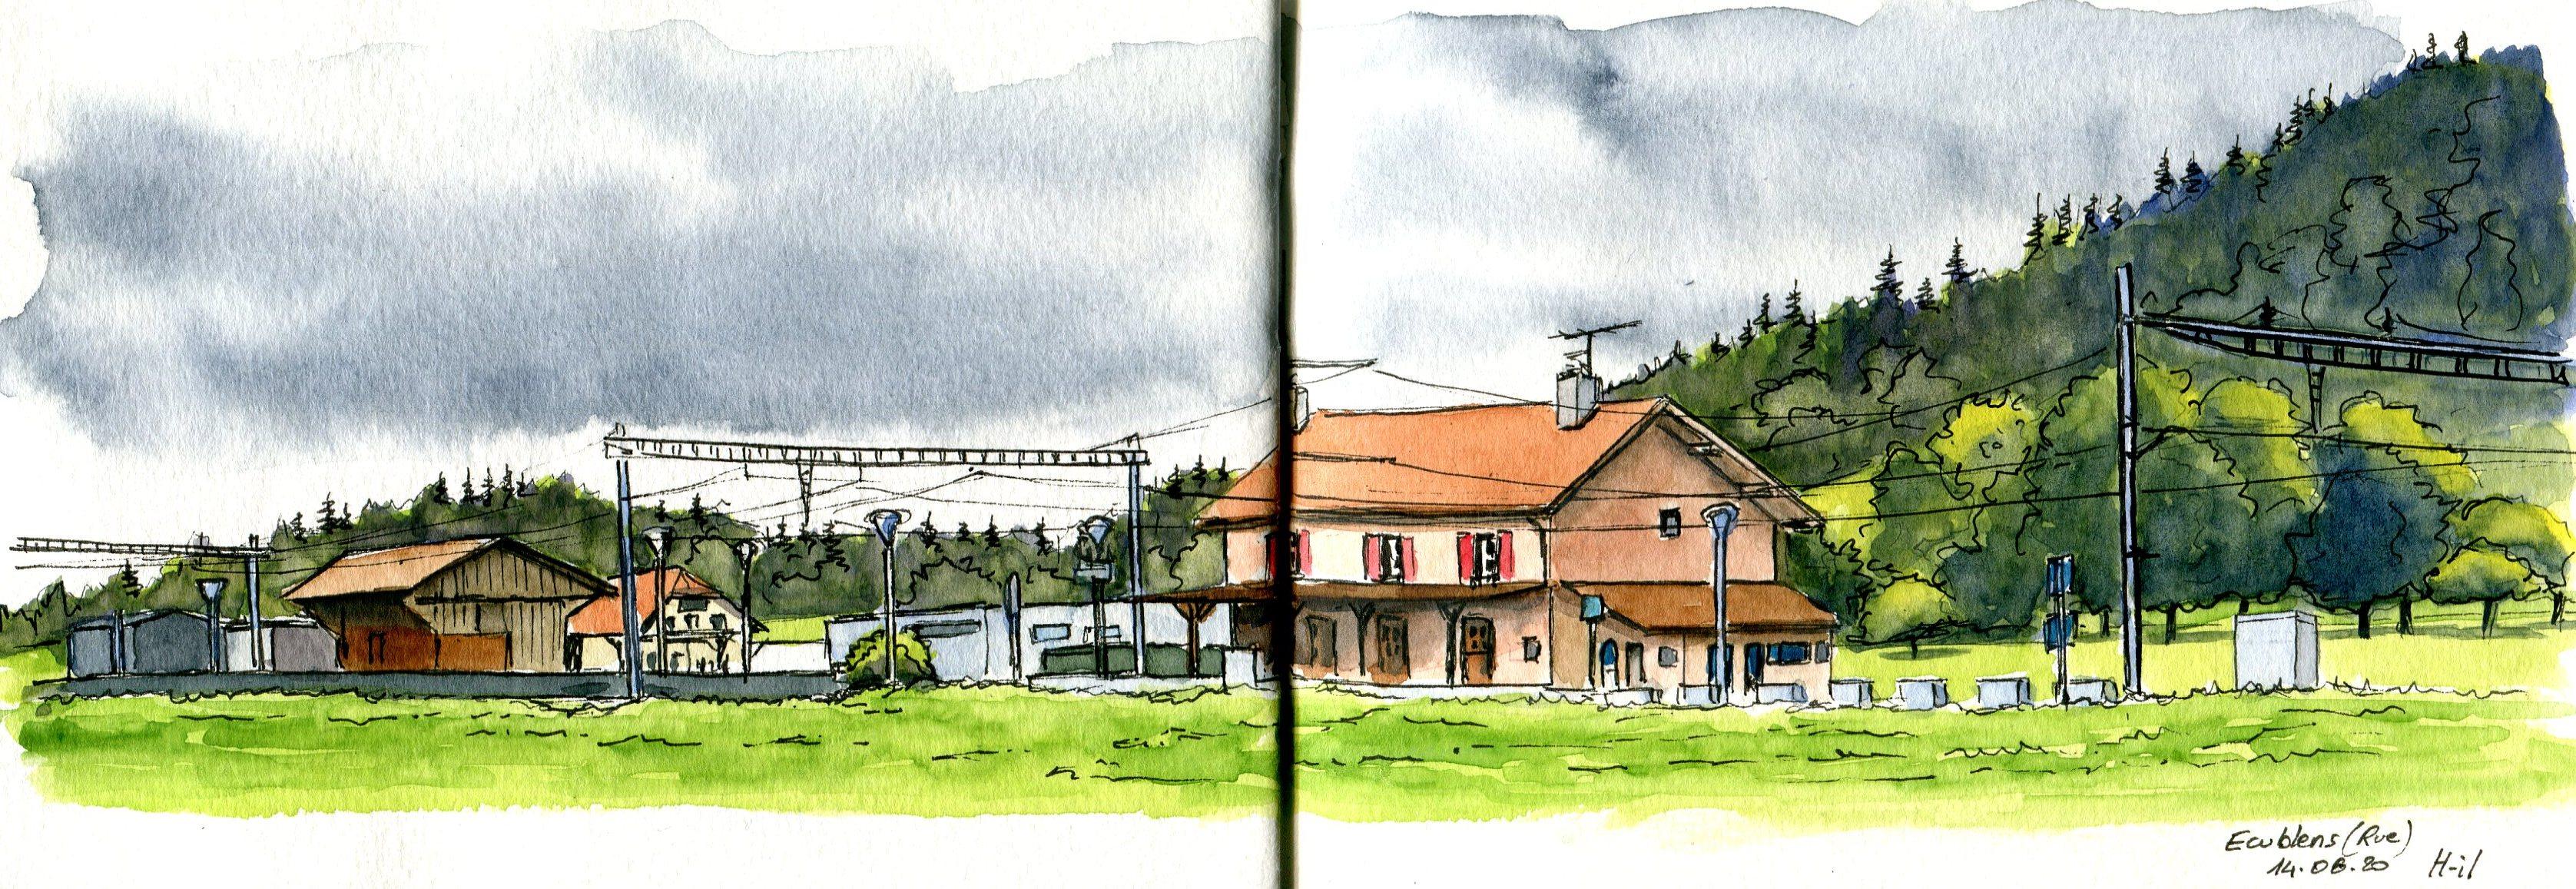 Gare Ecublens-Rue024